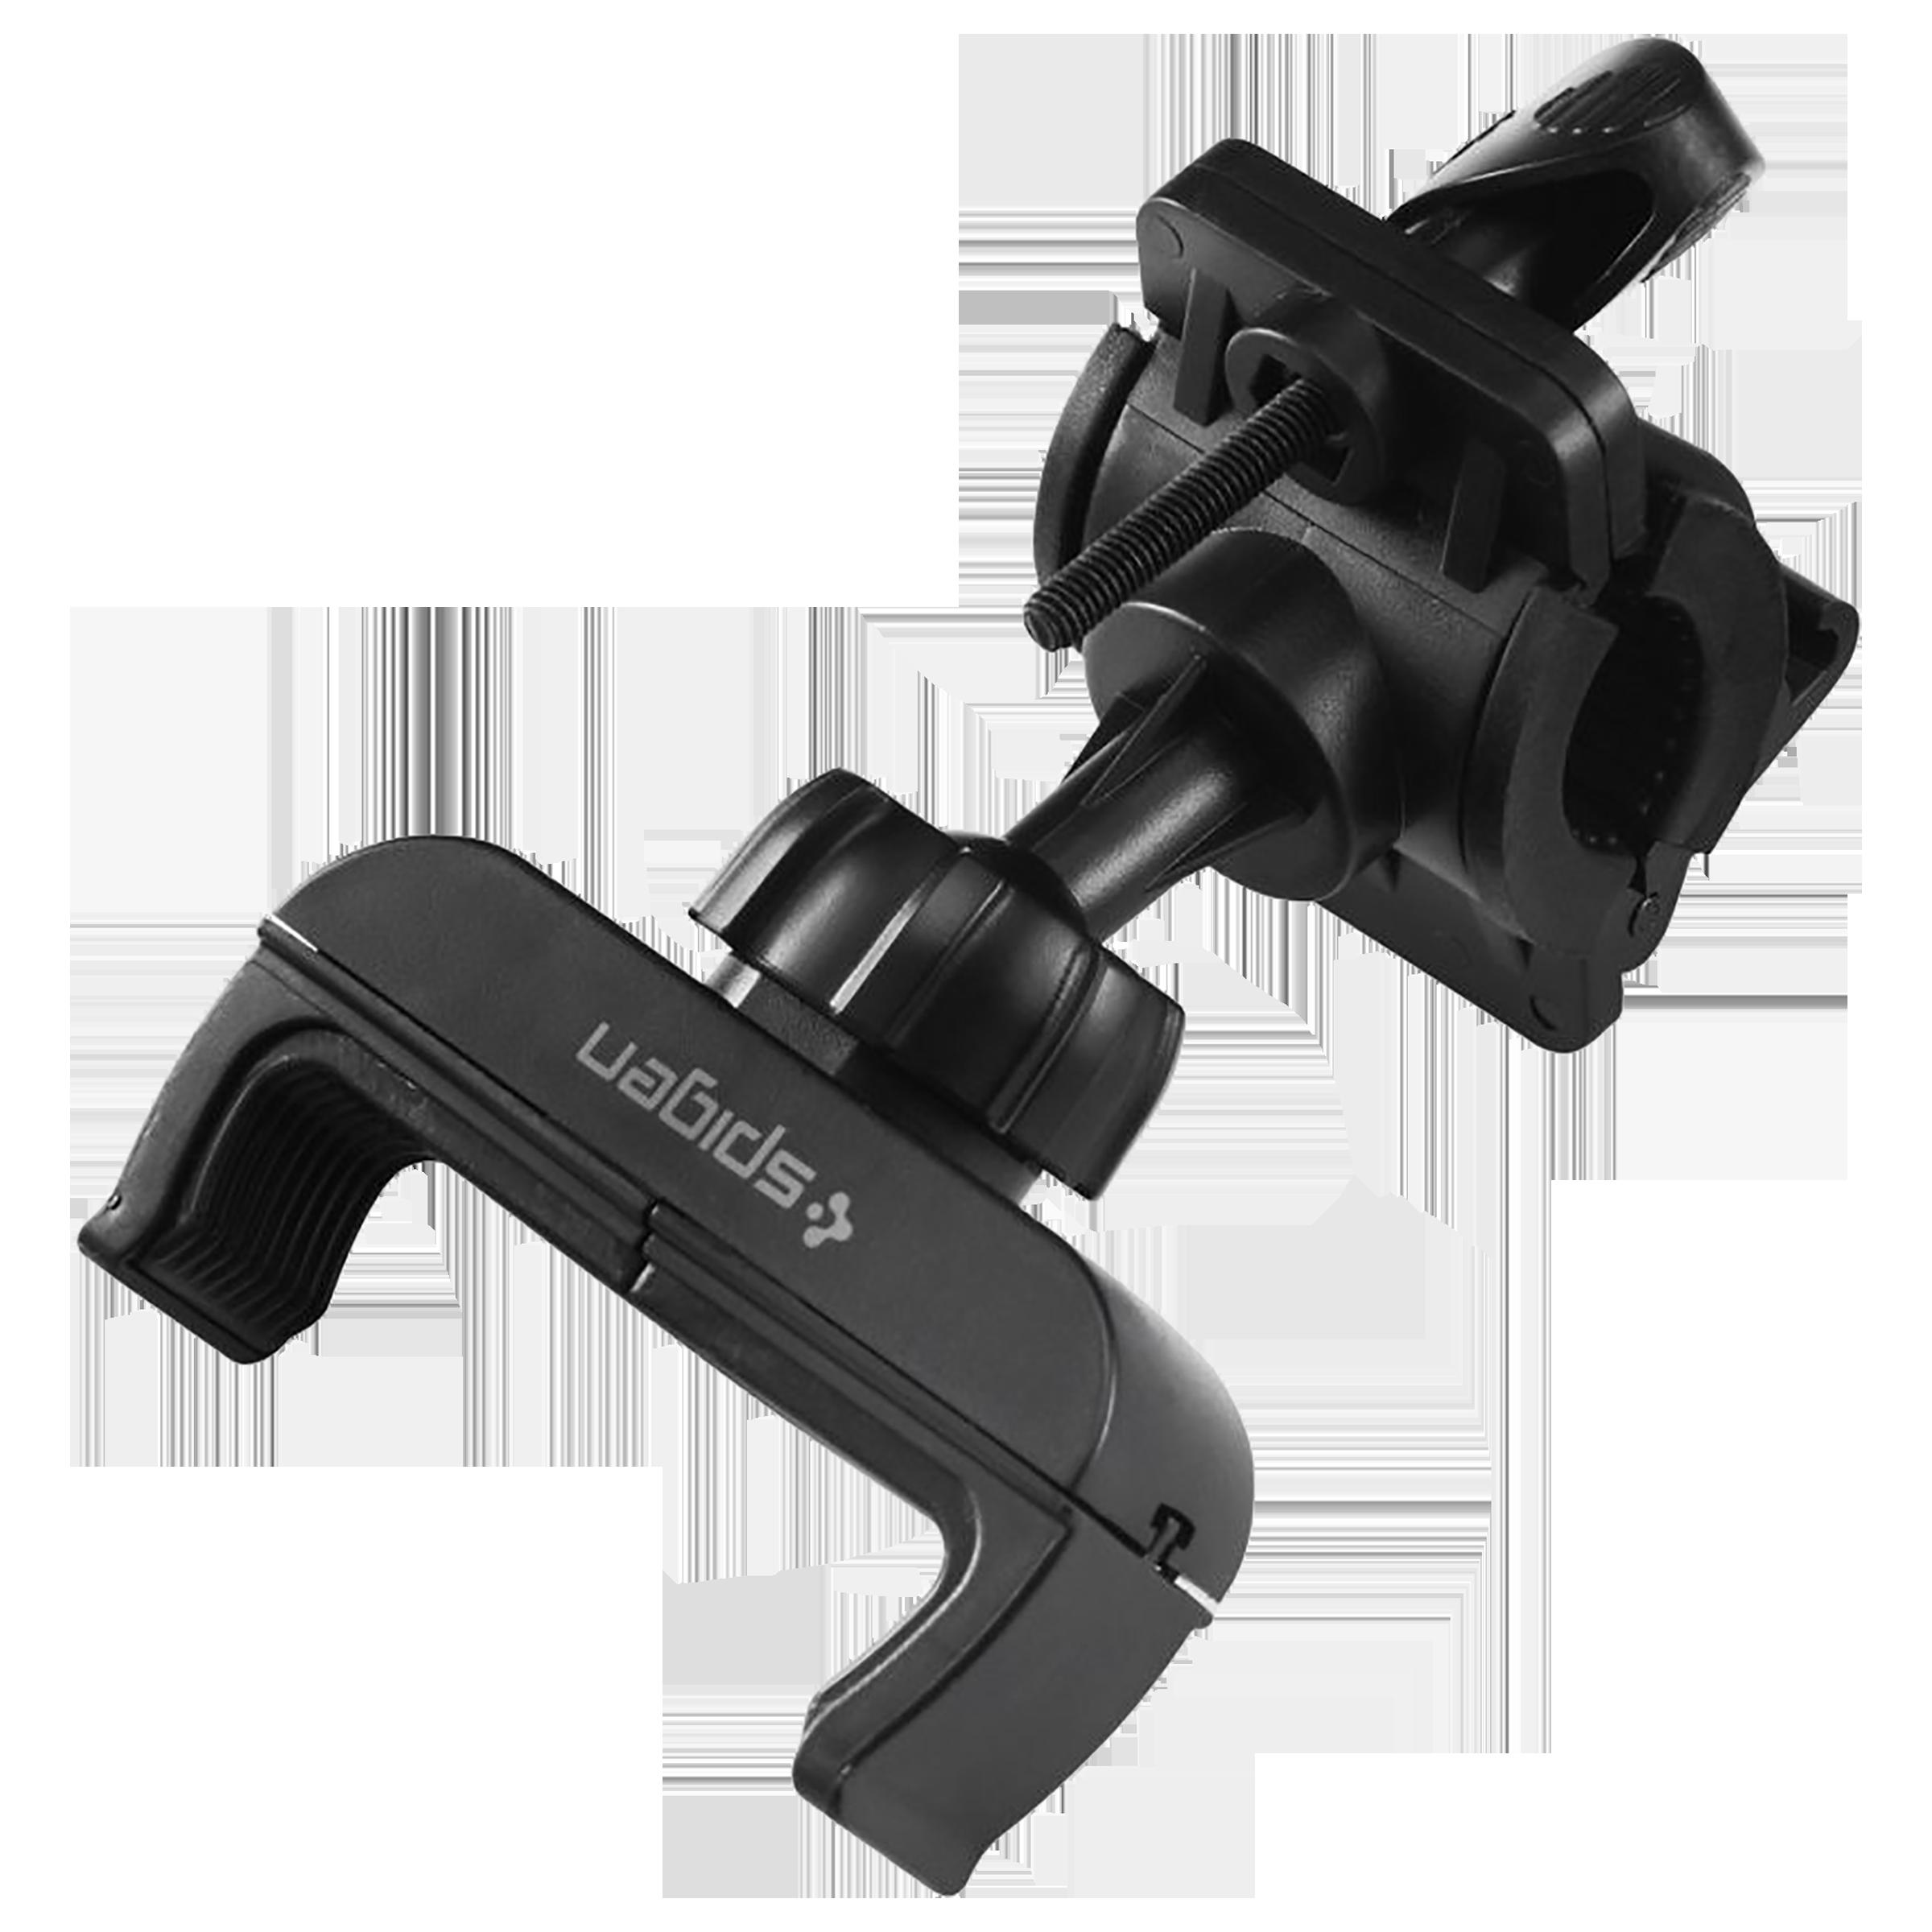 Spigen Velo A250 Mobile Holder (Dual-Mount Technology, 000CD20874, Black)_1